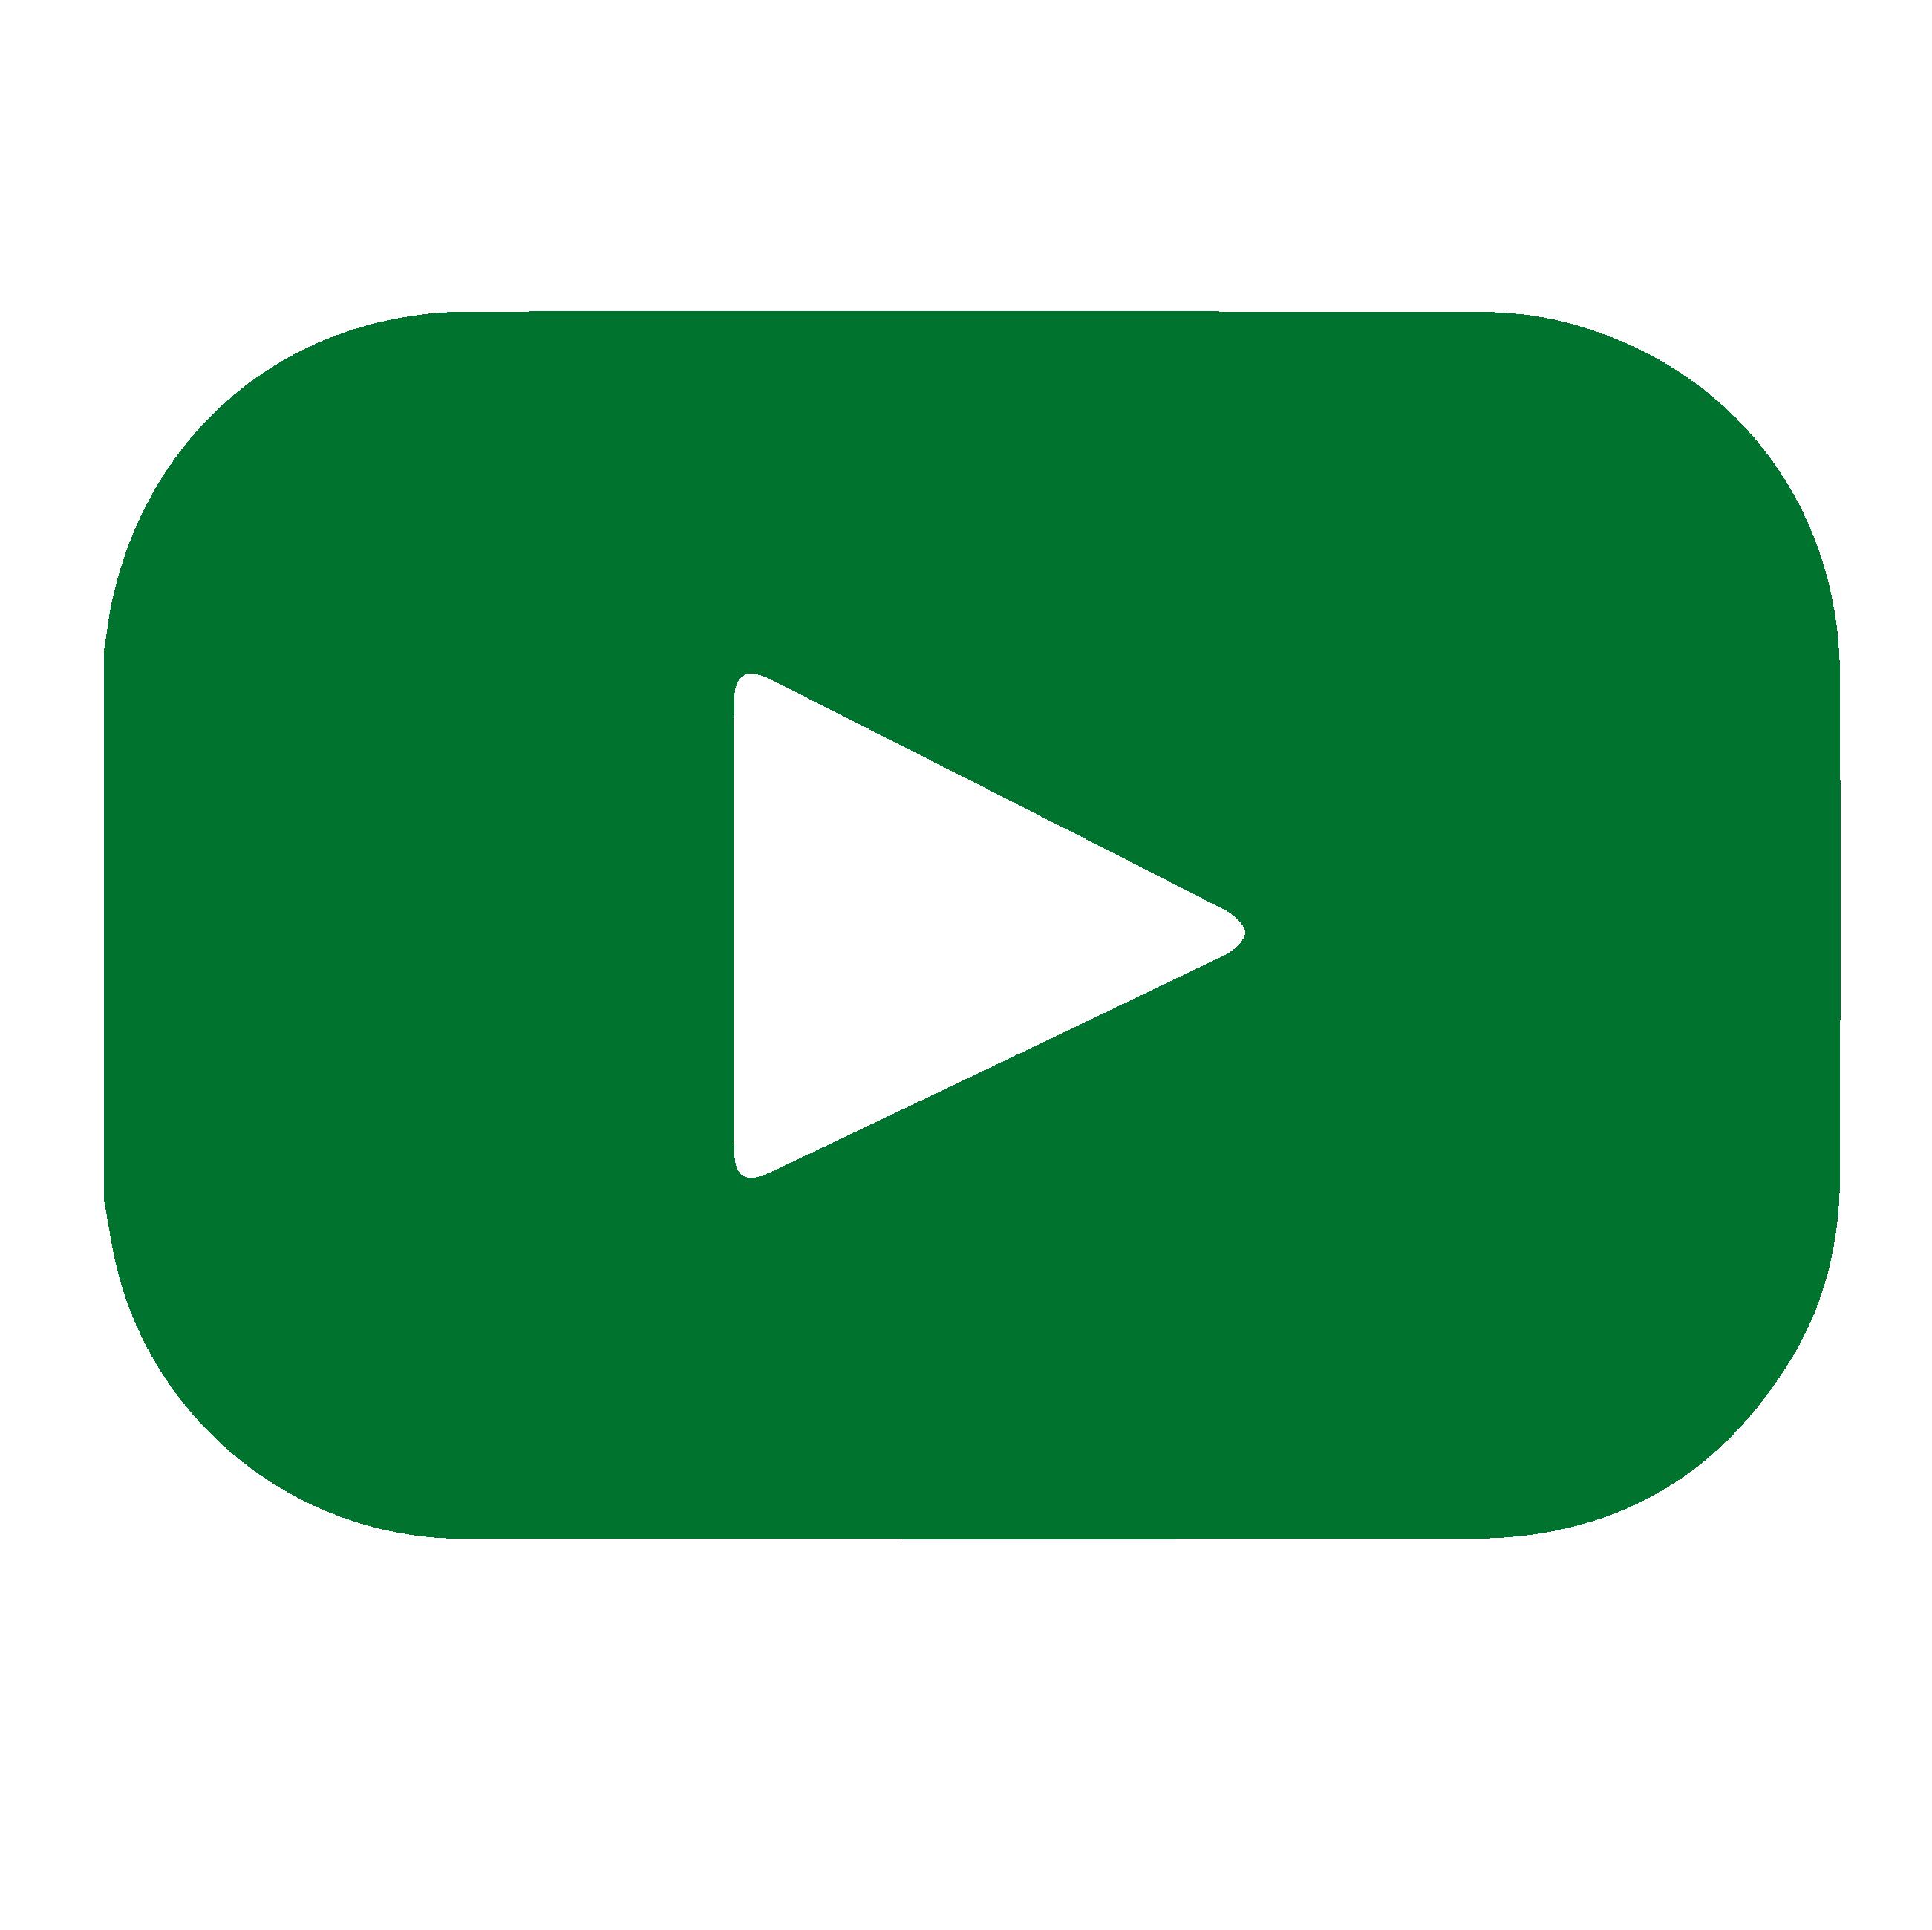 Green YouTube logo